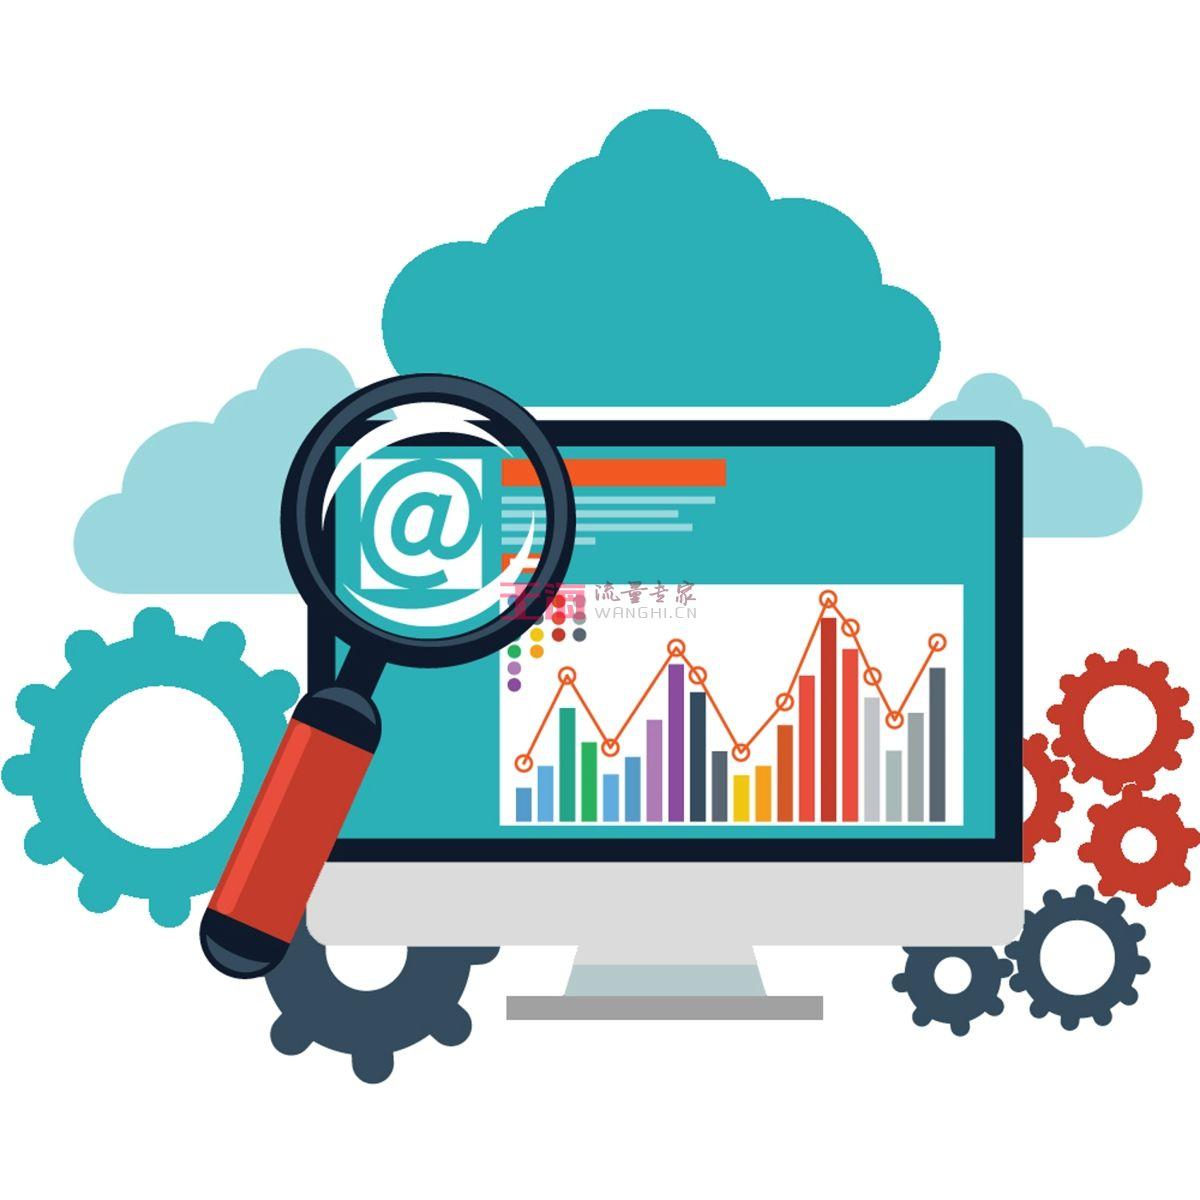 EvernoteDesign小白攻略_一个专门针对设计师资源的网站